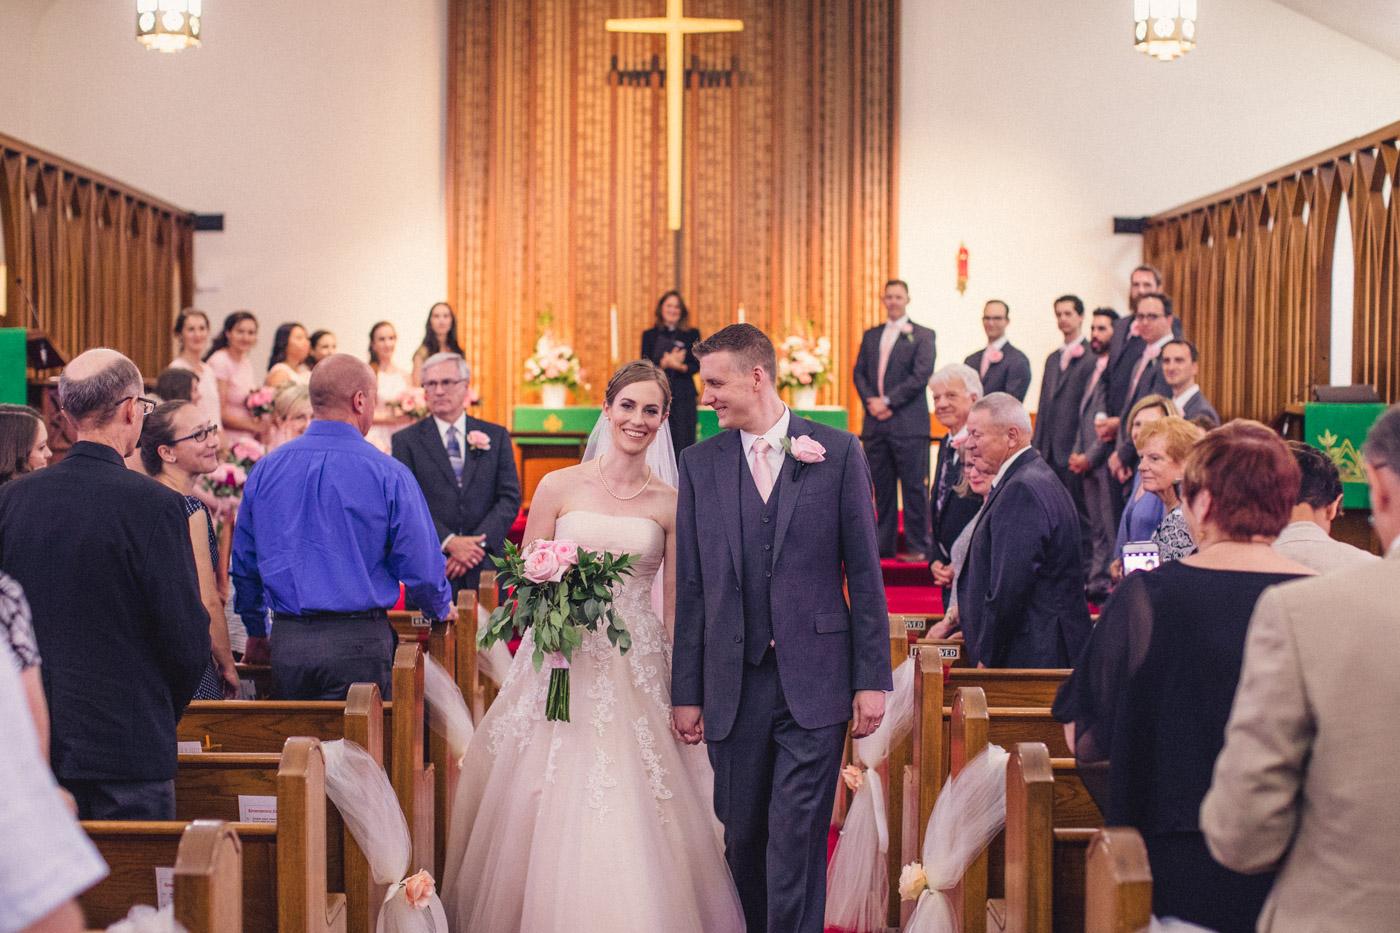 happy-bride-and-groom-after-wedding-ceremony